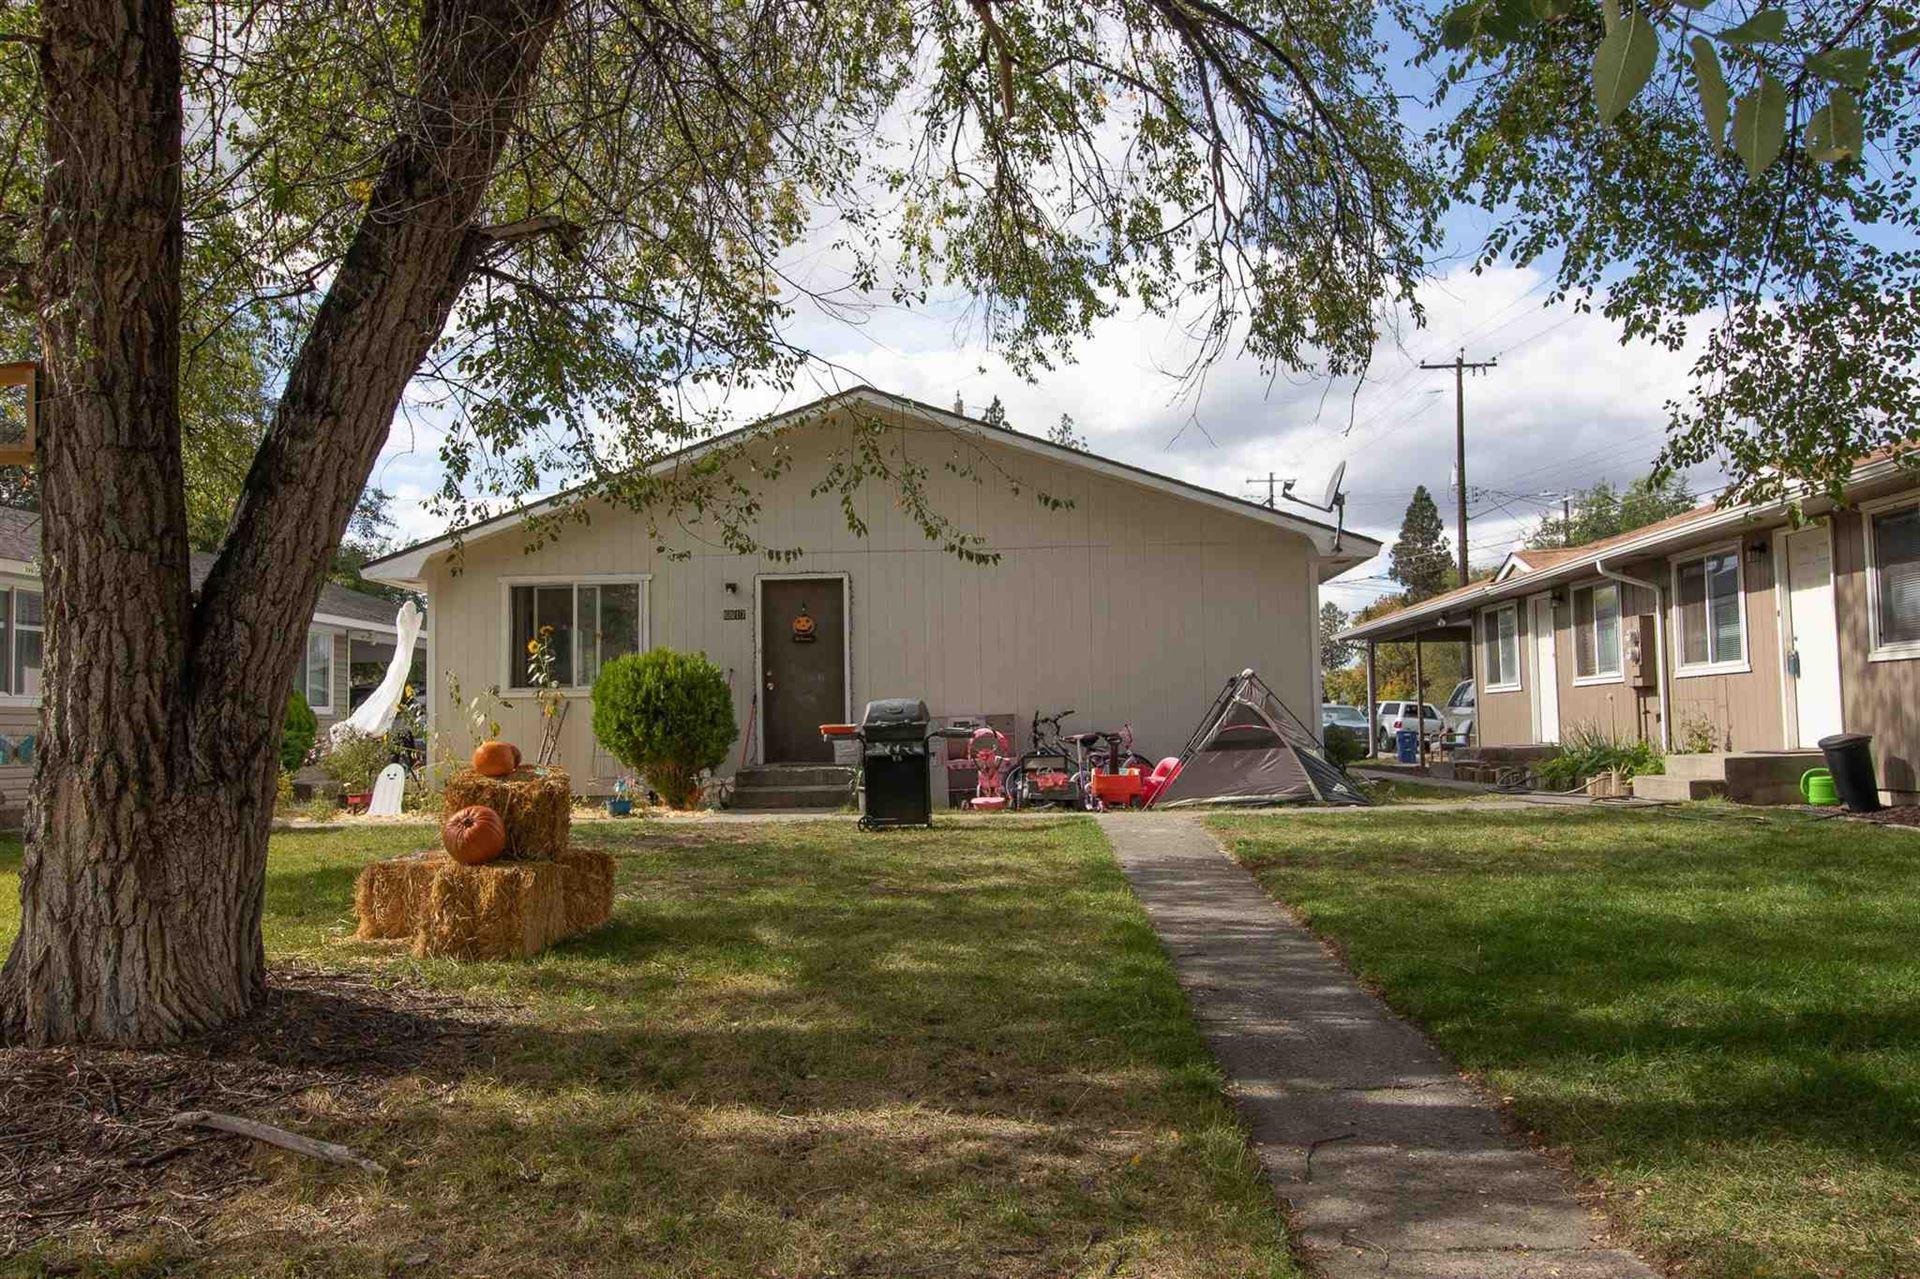 6617 N Lee St, Spokane, WA 99217 - #: 202123142